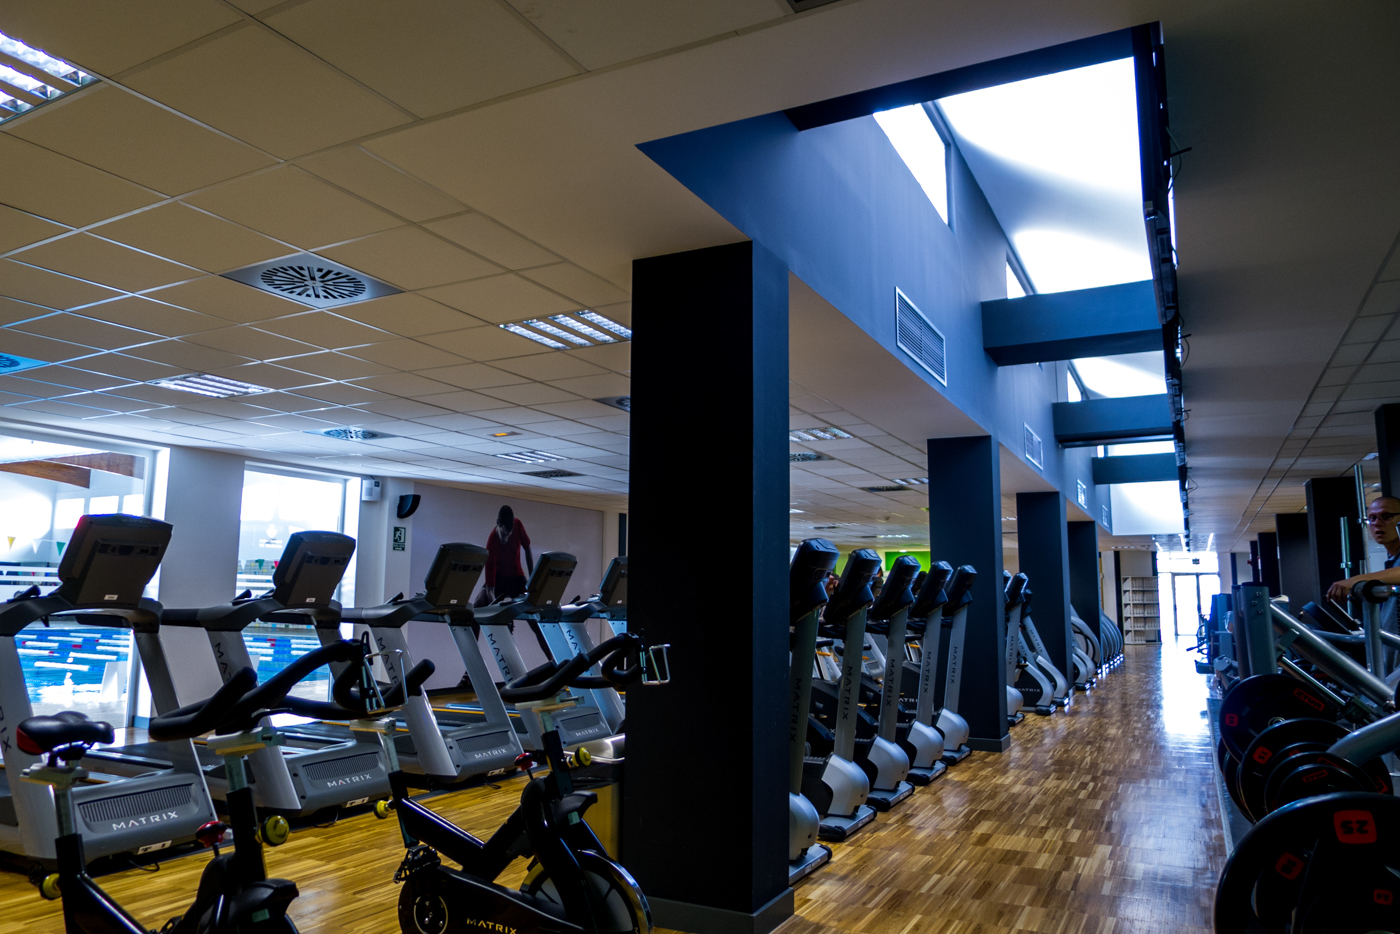 valencia rambleta fitness 2 estudio de arquitectura madrid